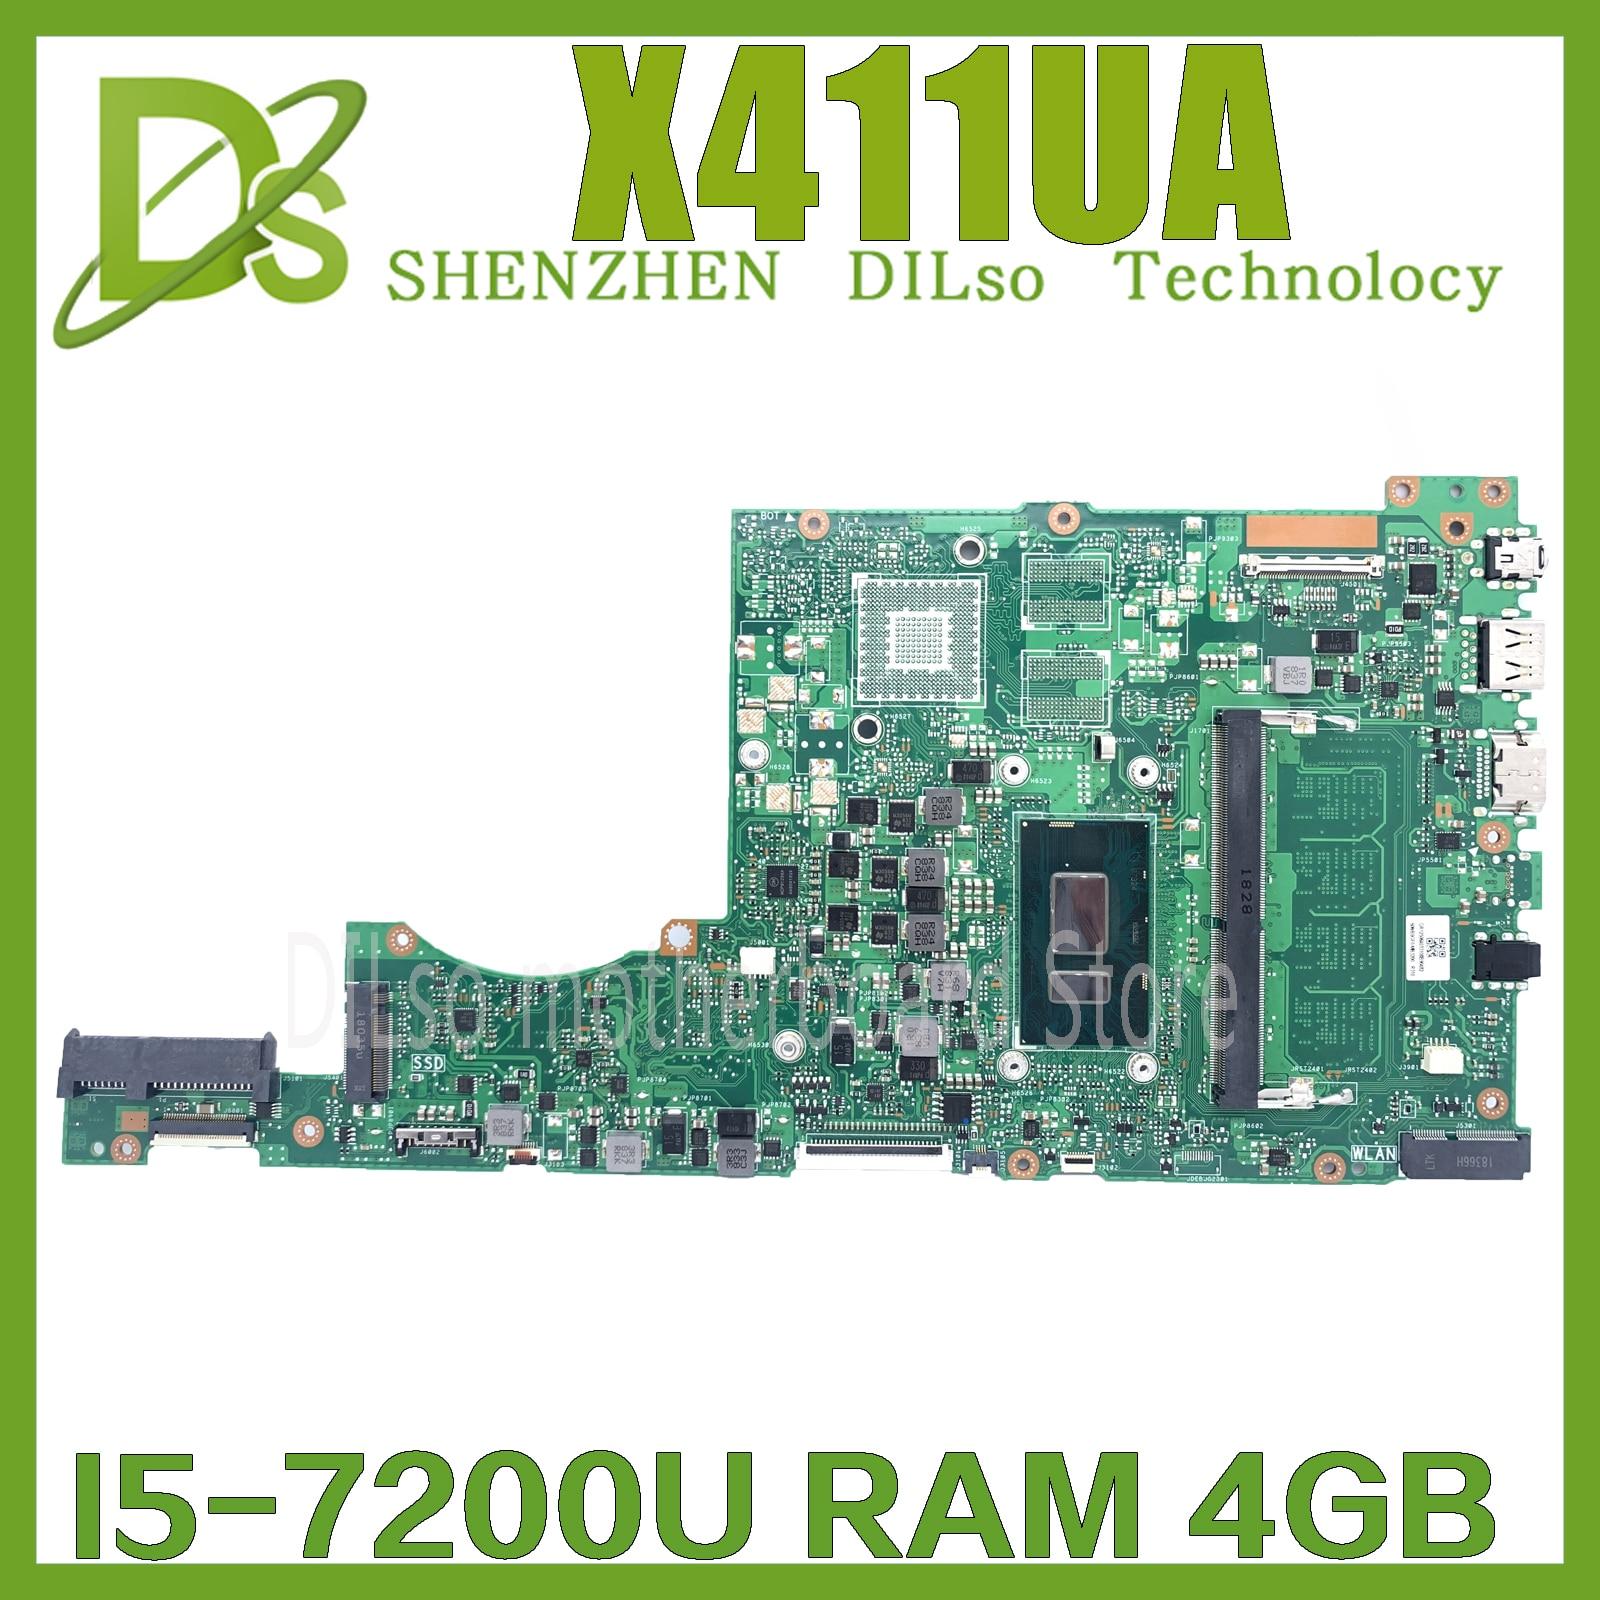 Get KEFU X411UA For ASUS X411UAK X411UQ S4200U X411UN X411UR X411URR X411URP X411UF Laptop Motherboard work I5-7200U 4GB